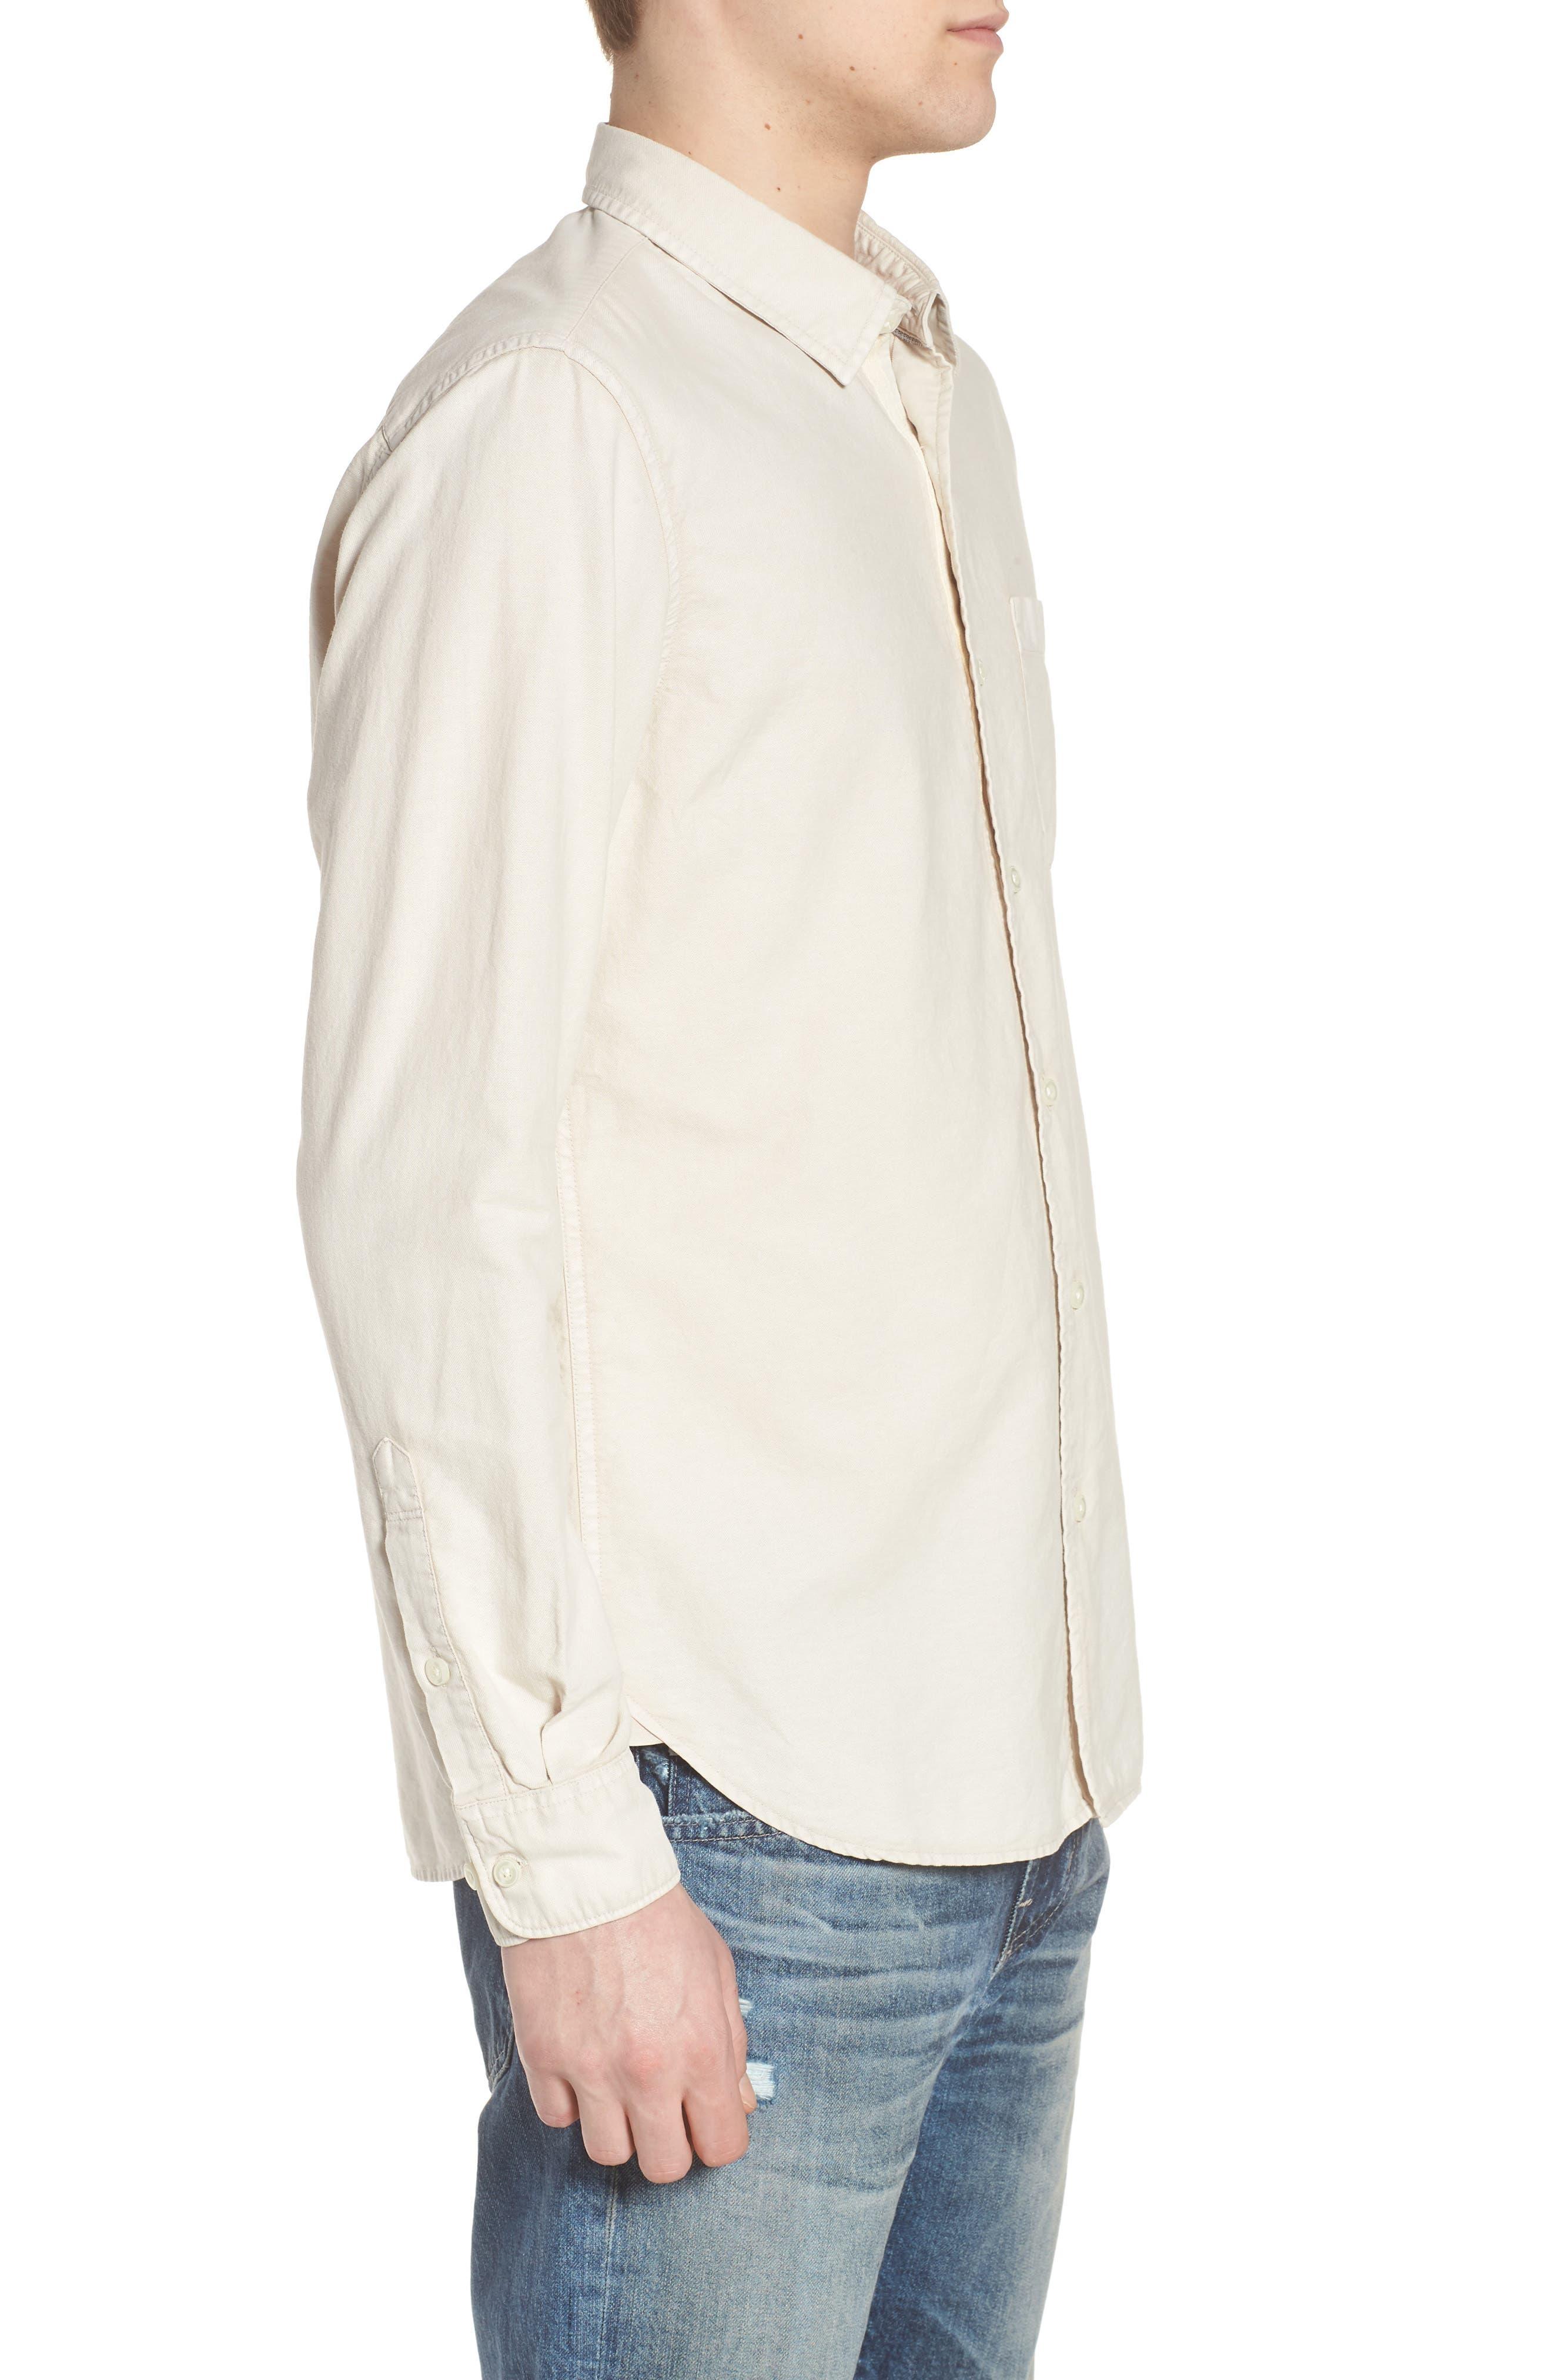 Bristol Slim Fit Sport Shirt,                             Alternate thumbnail 3, color,                             Sunbaked Mineral Veil